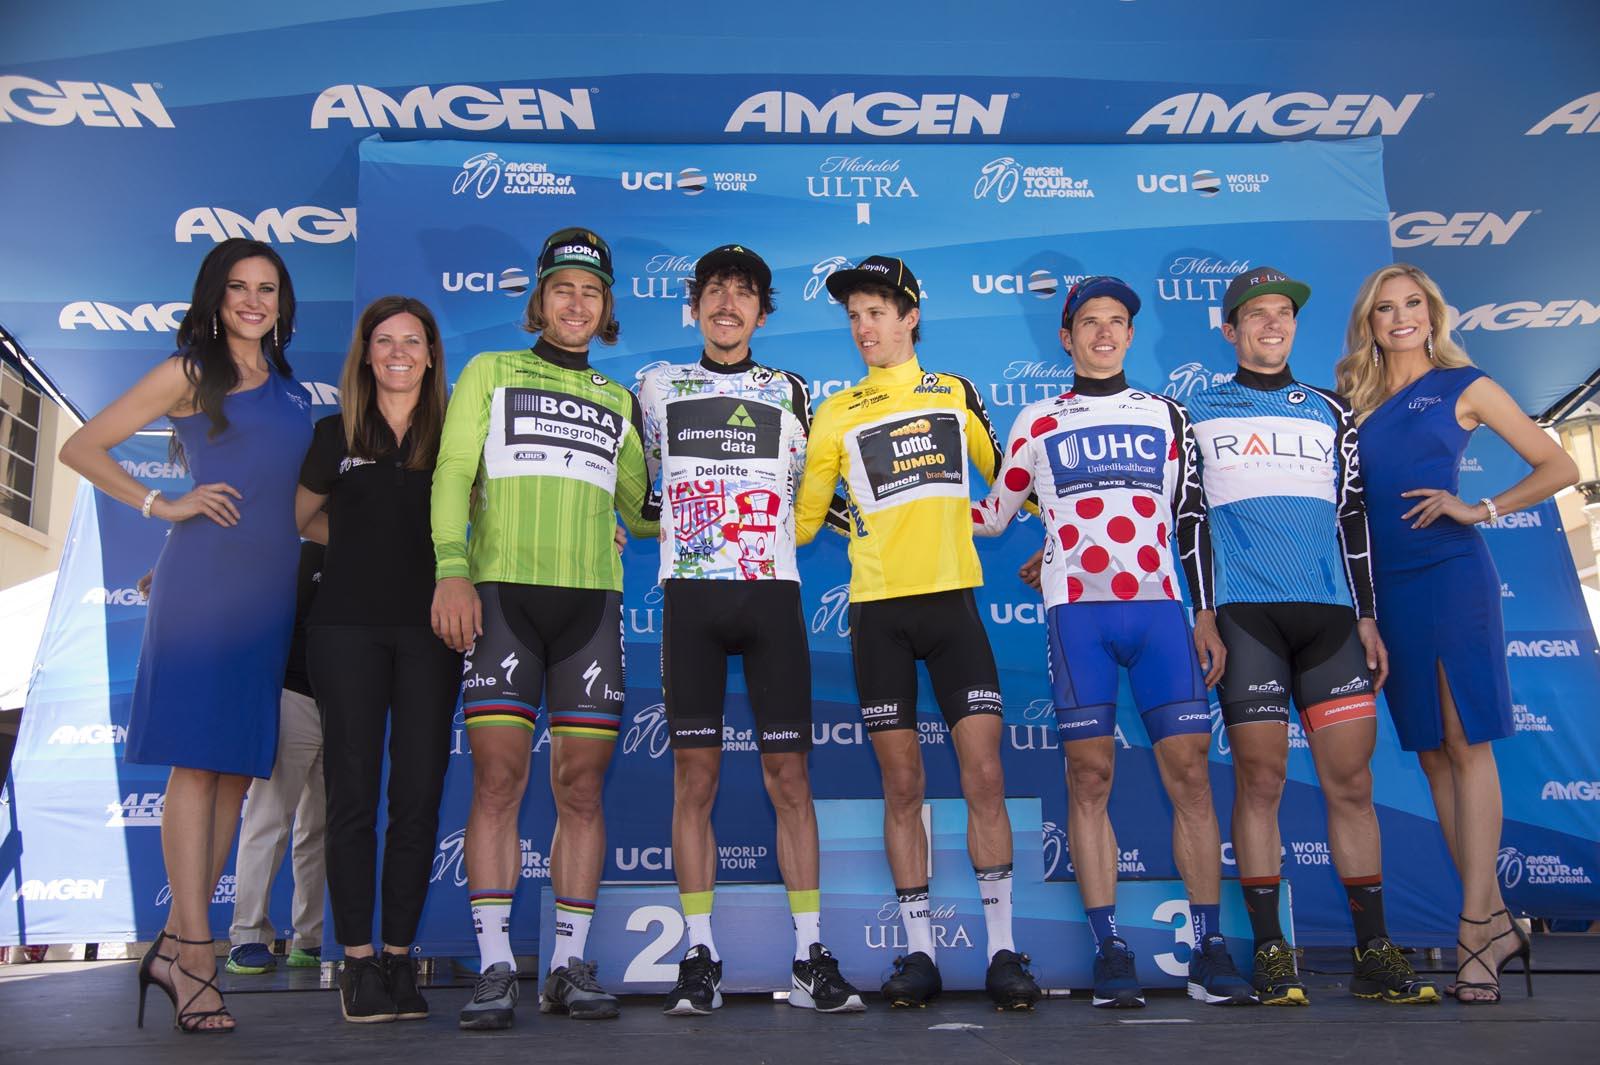 Tour of California Stage 7 Podium